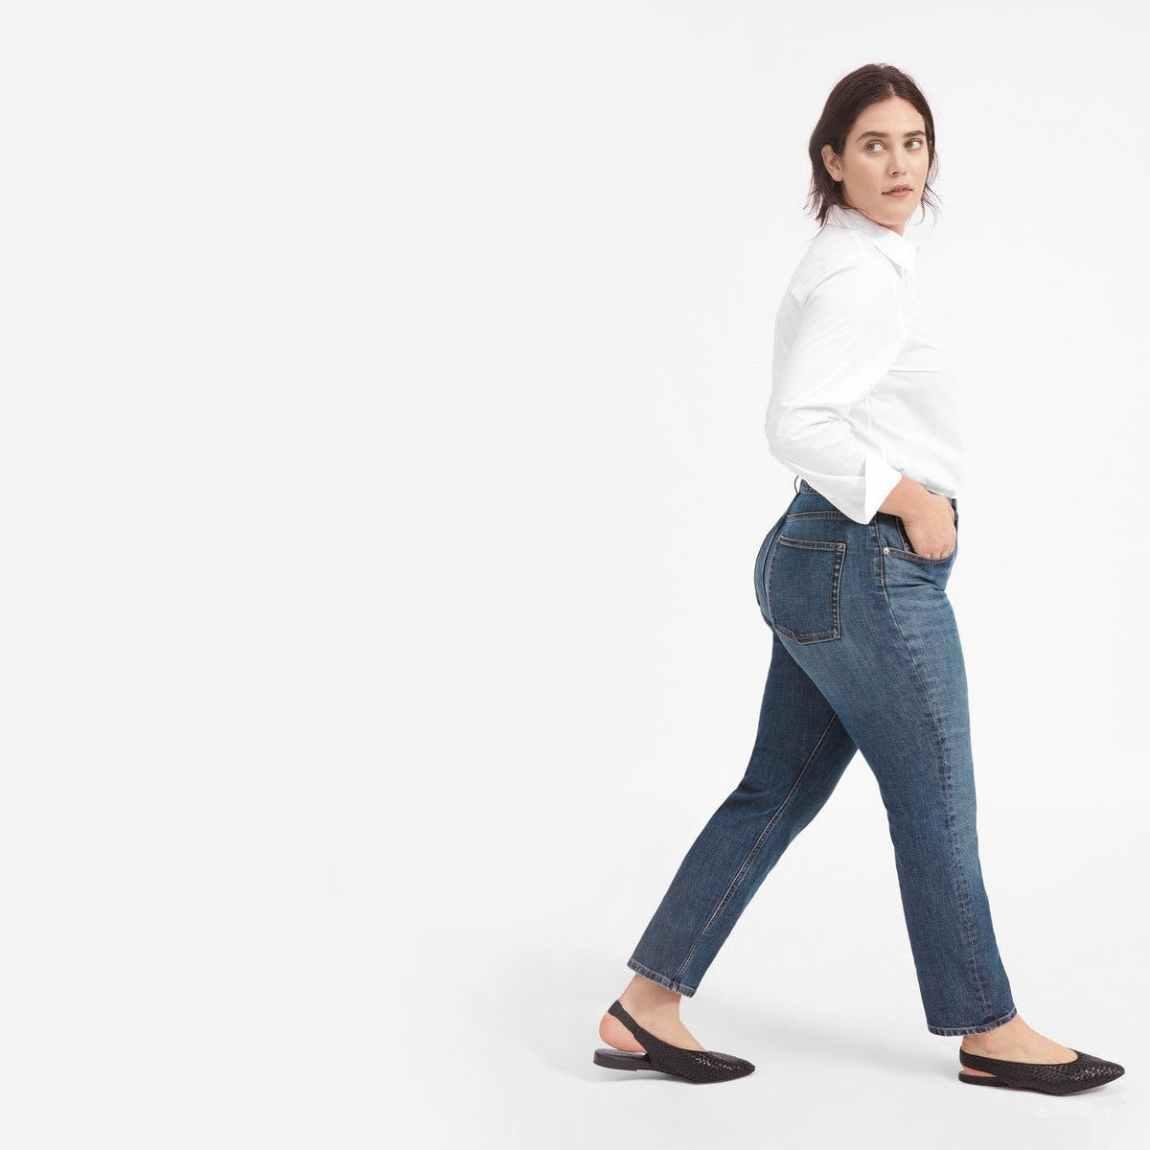 everlane, everlane jeans, everlane denim, japanese denim, the cheeky jeans, straight leg jeans, high rise jeans, tilted jeans, medium dark denim, cropped jeans, denimblog, denim blog